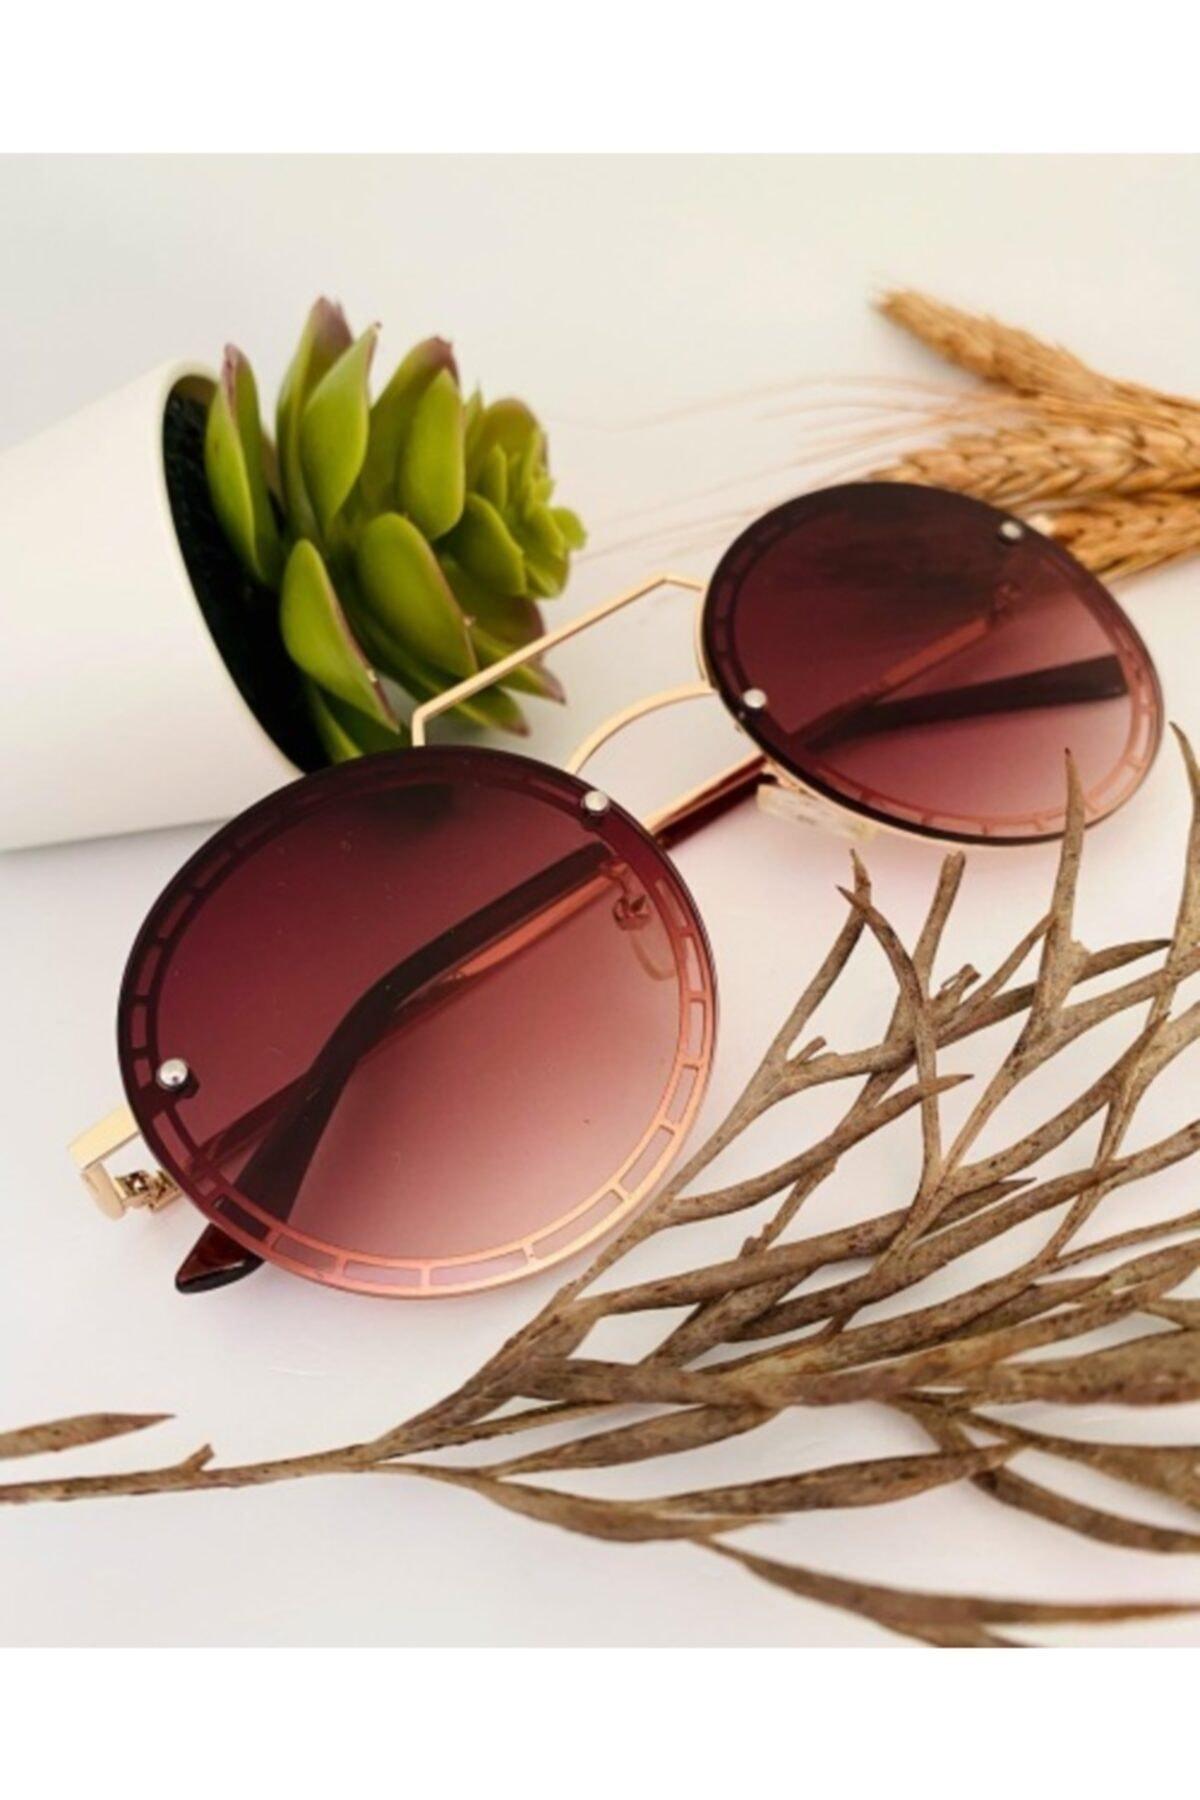 Max Polo Kadın Güneş Gözlüğü 1